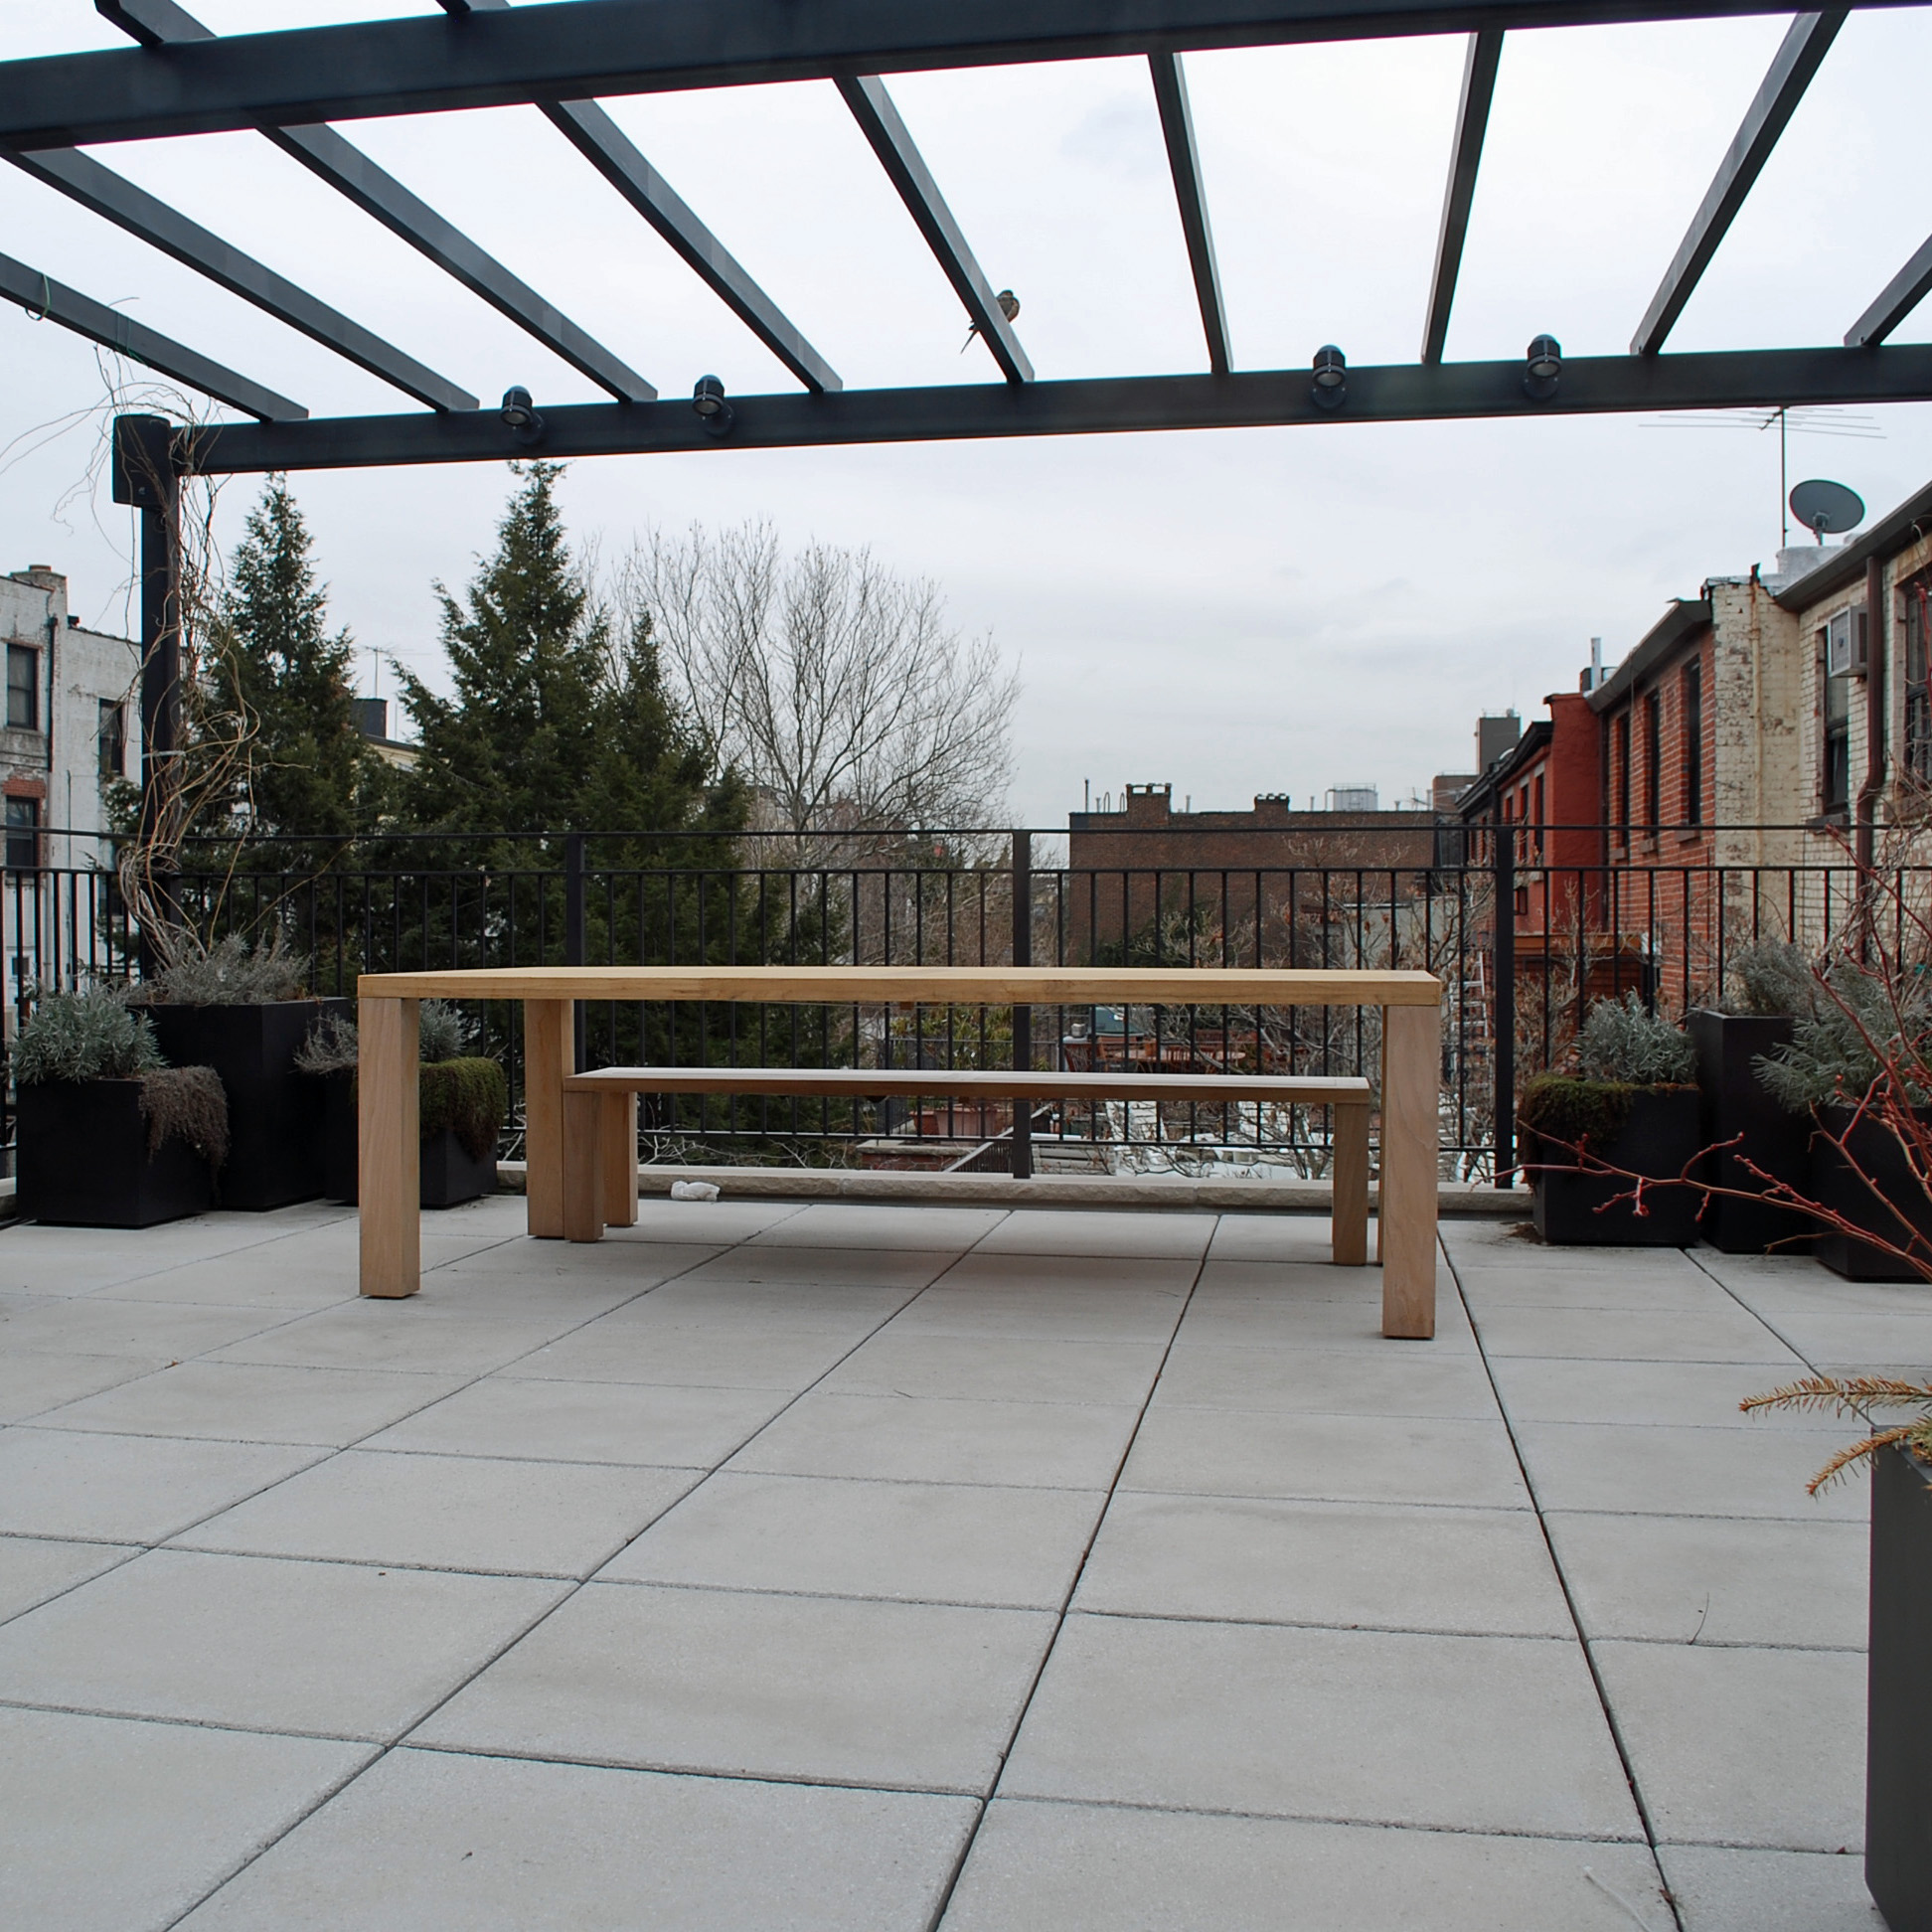 k 3rd Fl Roof Deck.jpg